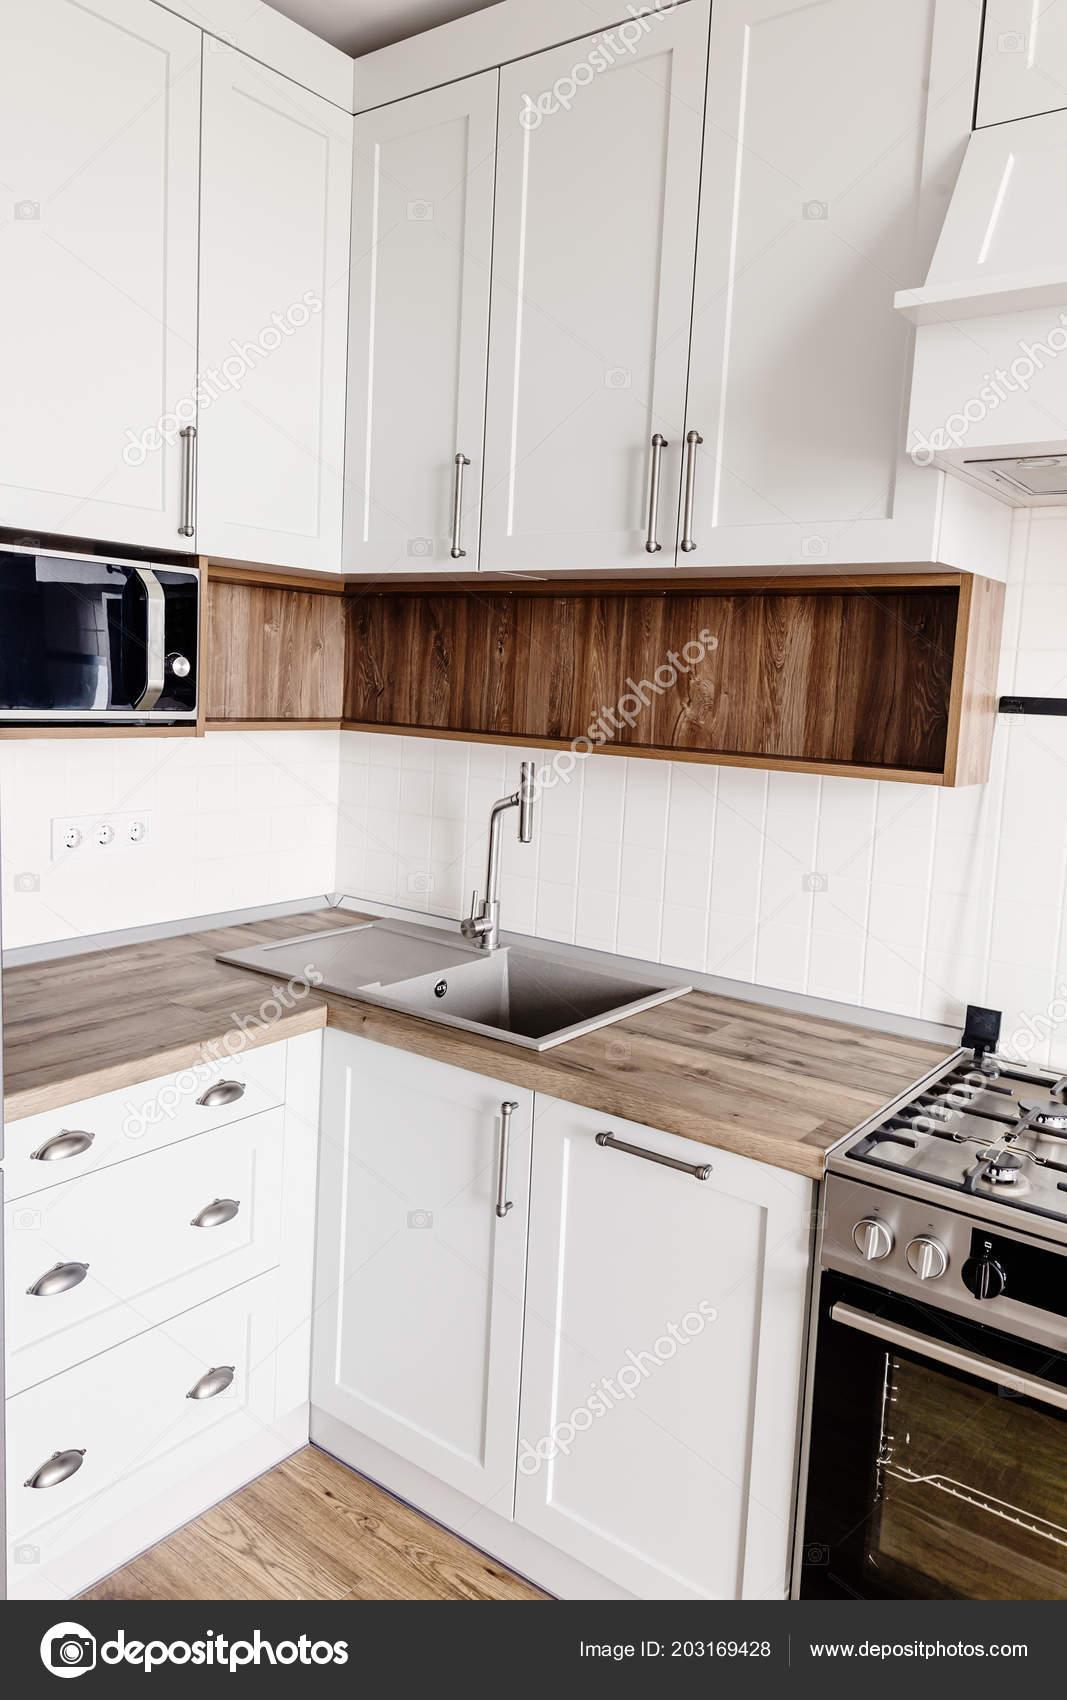 Kitchen Design Modern Scandinavian Style Stylish Light Grey Kitchen Interior Stock Photo C Sonyachny 203169428